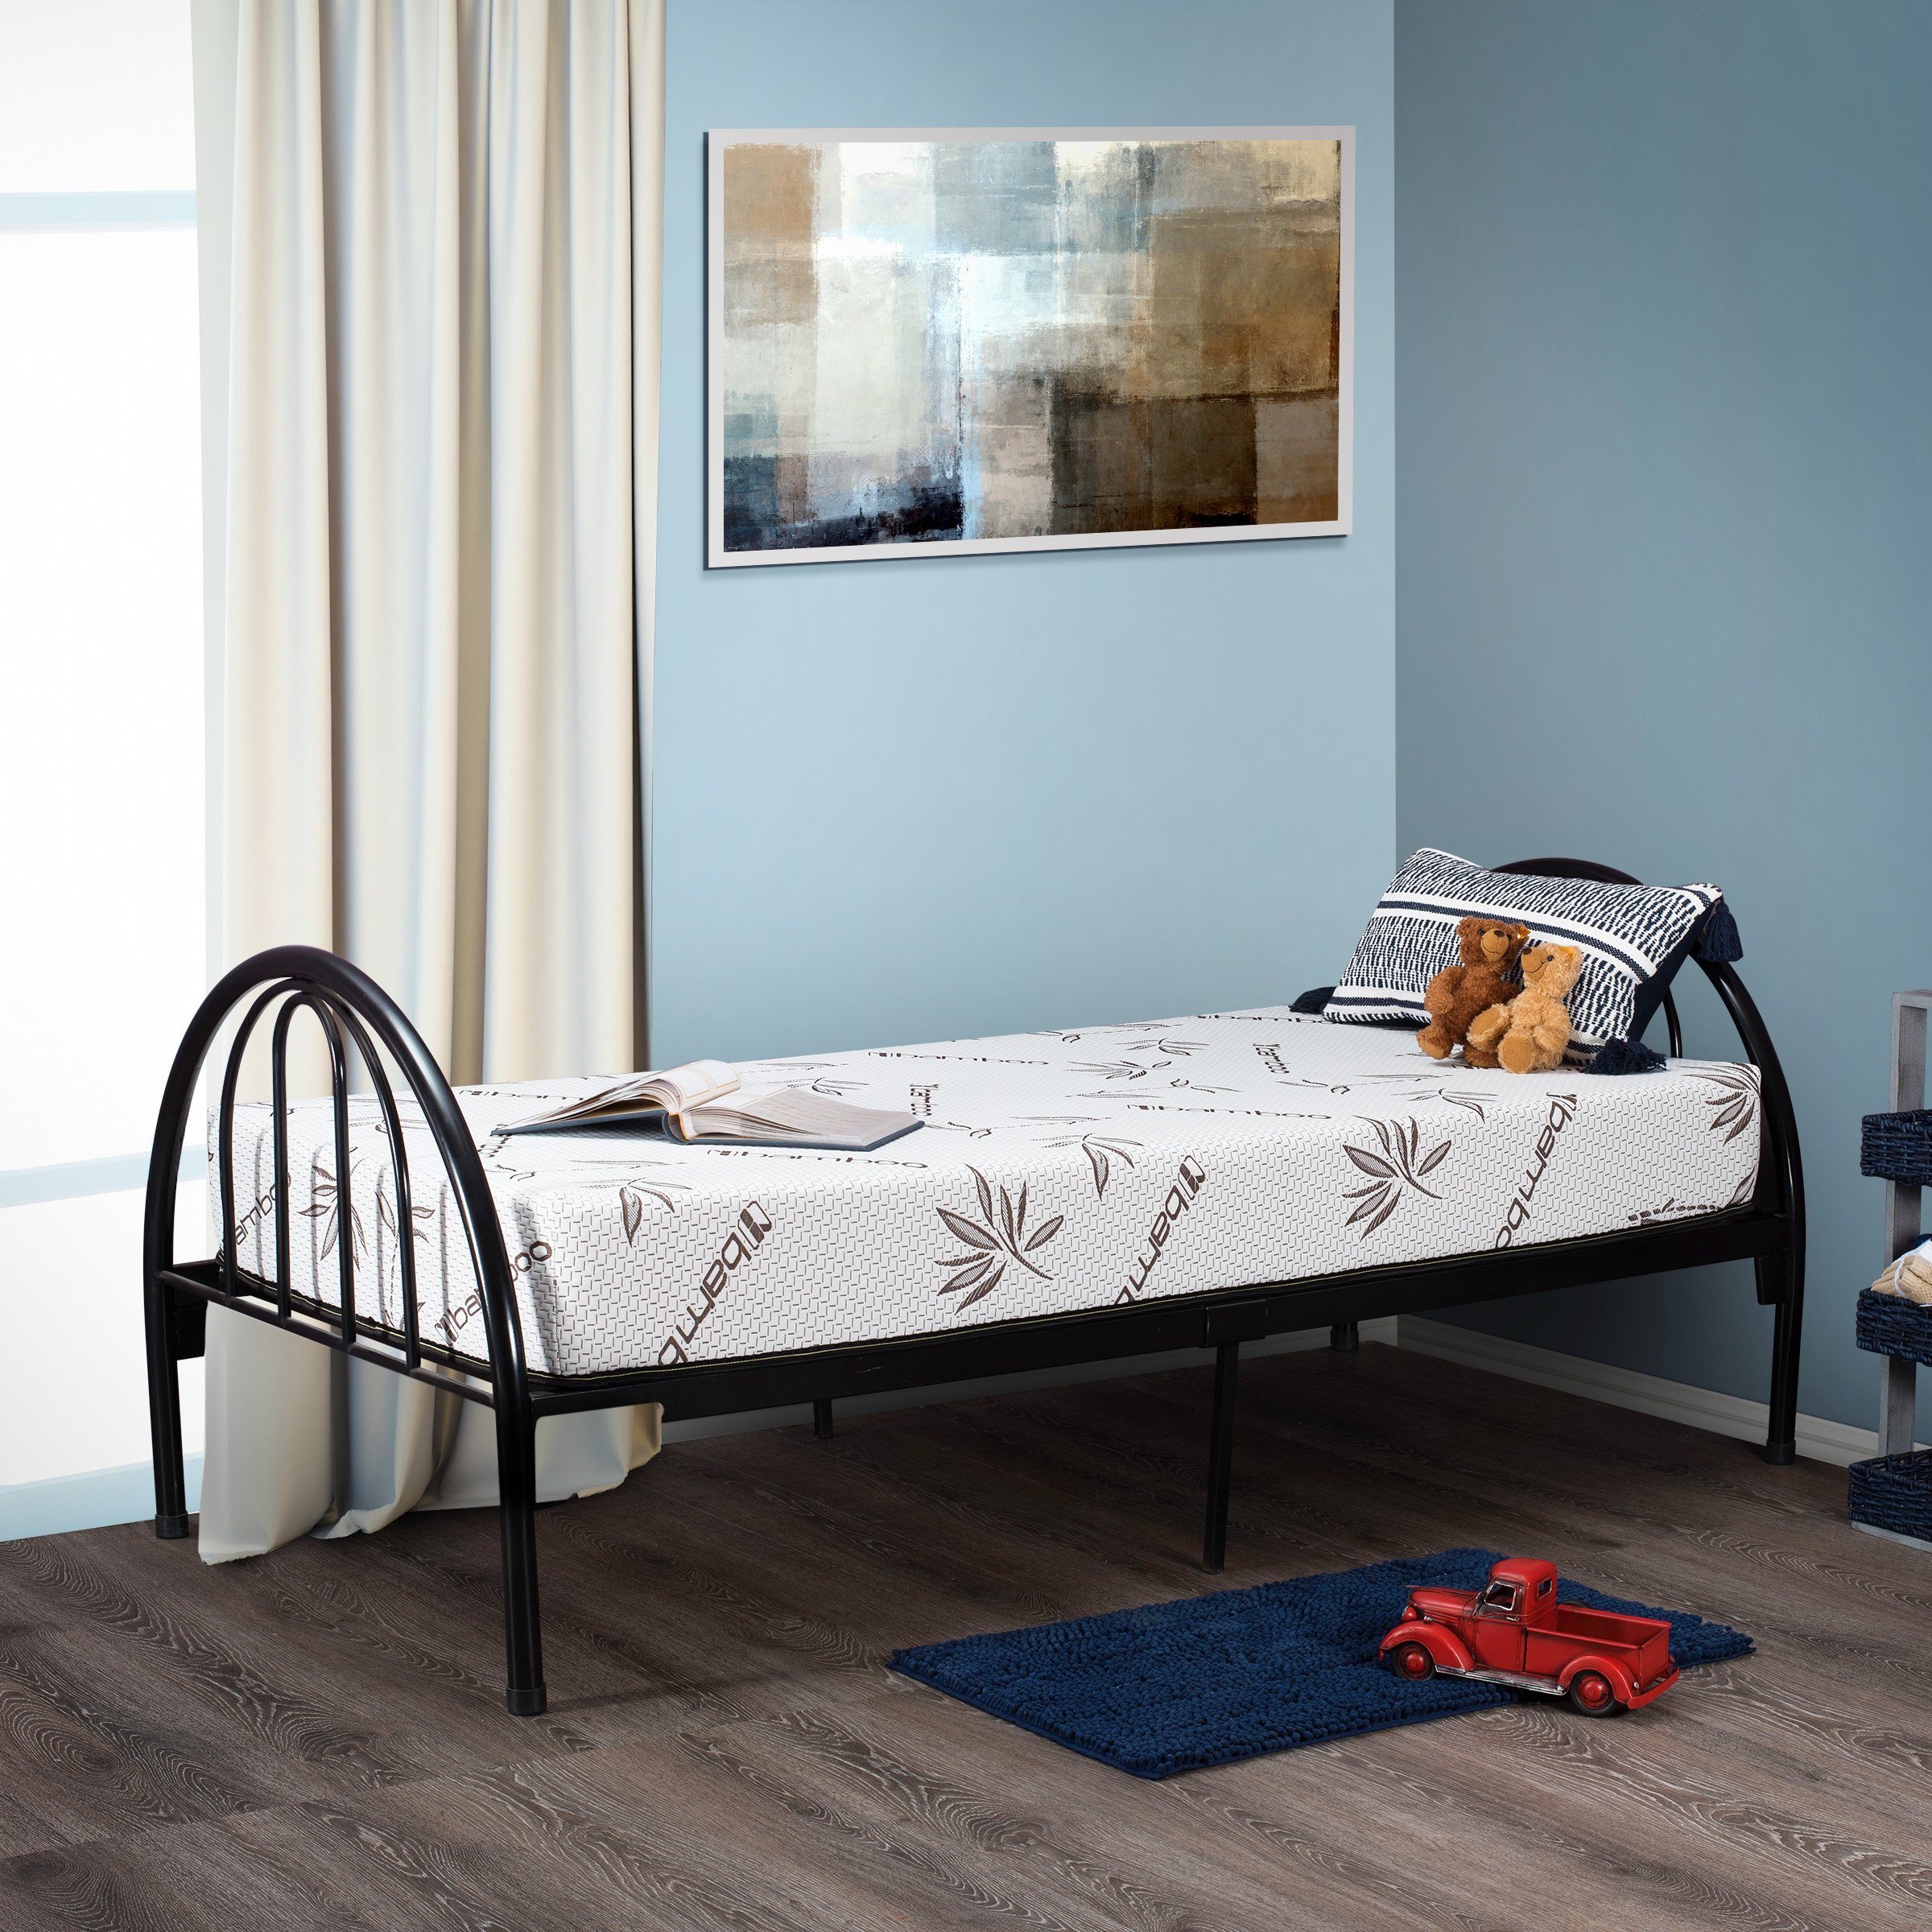 Customize Bed Mattress CertiPUR US Certified